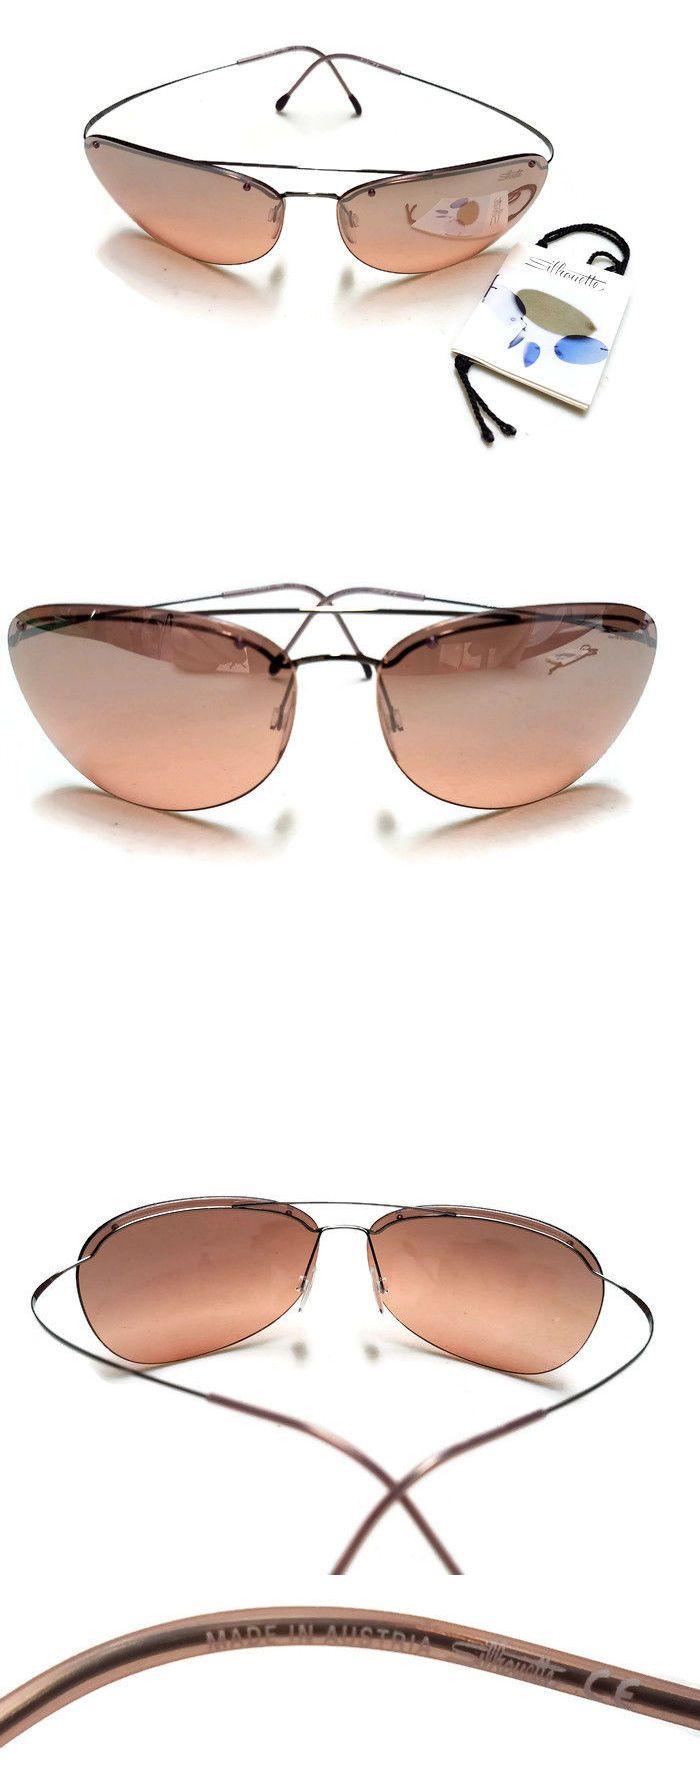 Eyeglass Cases: Vintage Silhouette Sunglasses Titan Rimless Polarized M8575/65 V 6063 BUY IT NOW ONLY: $219.0